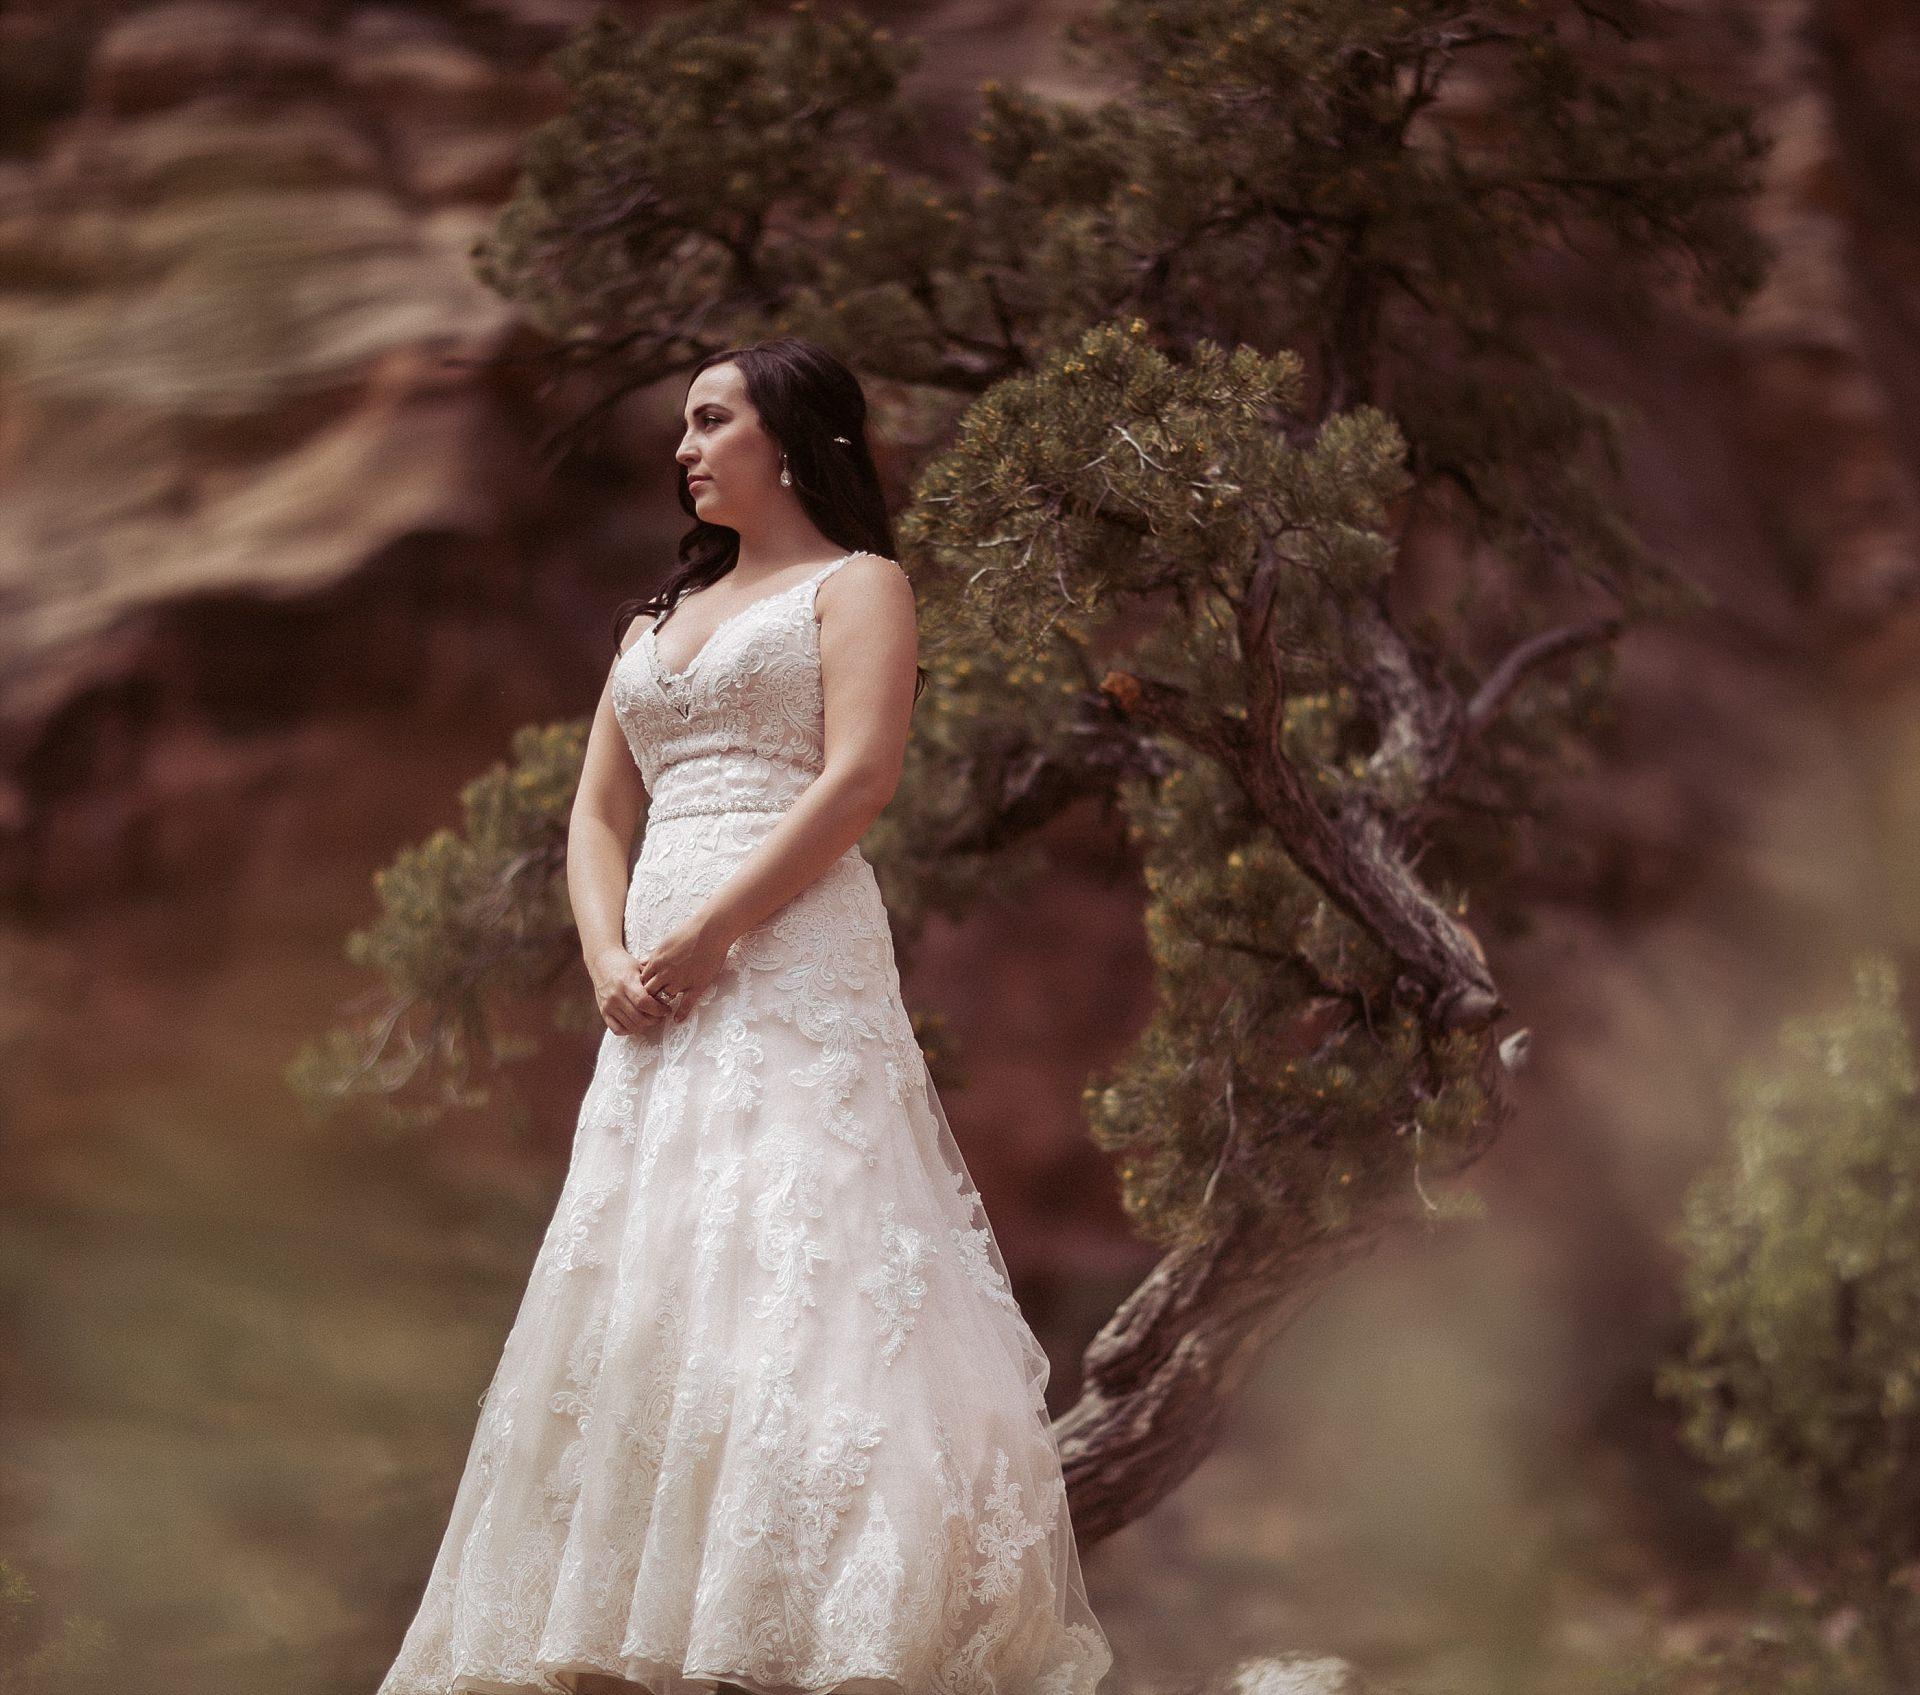 Hicks-Zion-National-Park-Wedding-0004.jpg